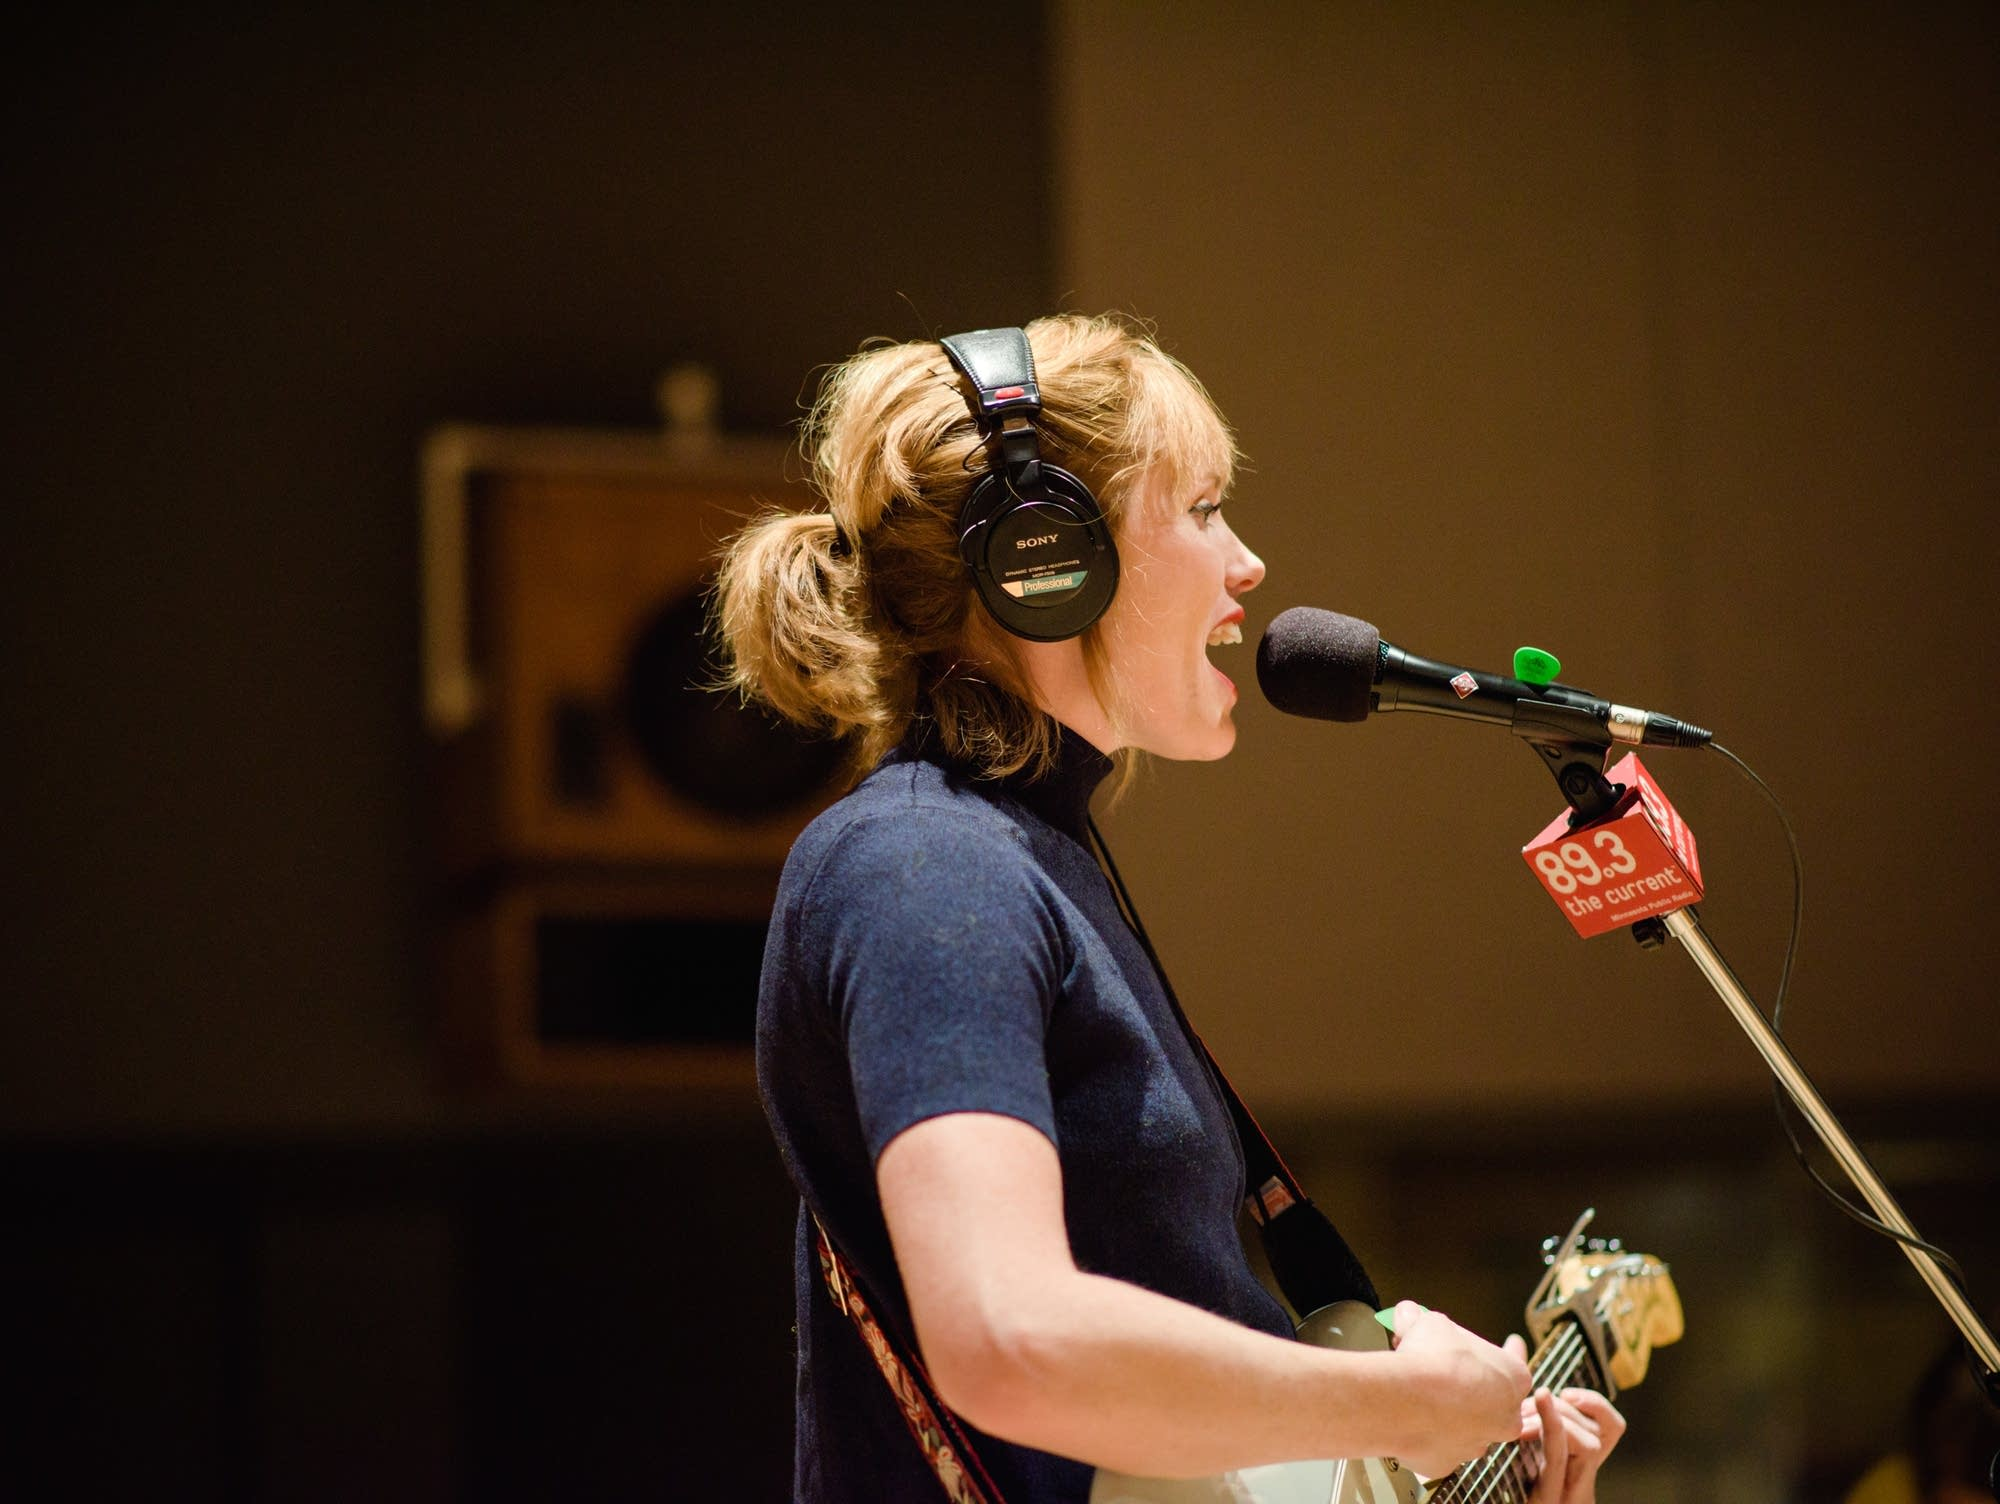 Haley Bonar performs in The Current studio